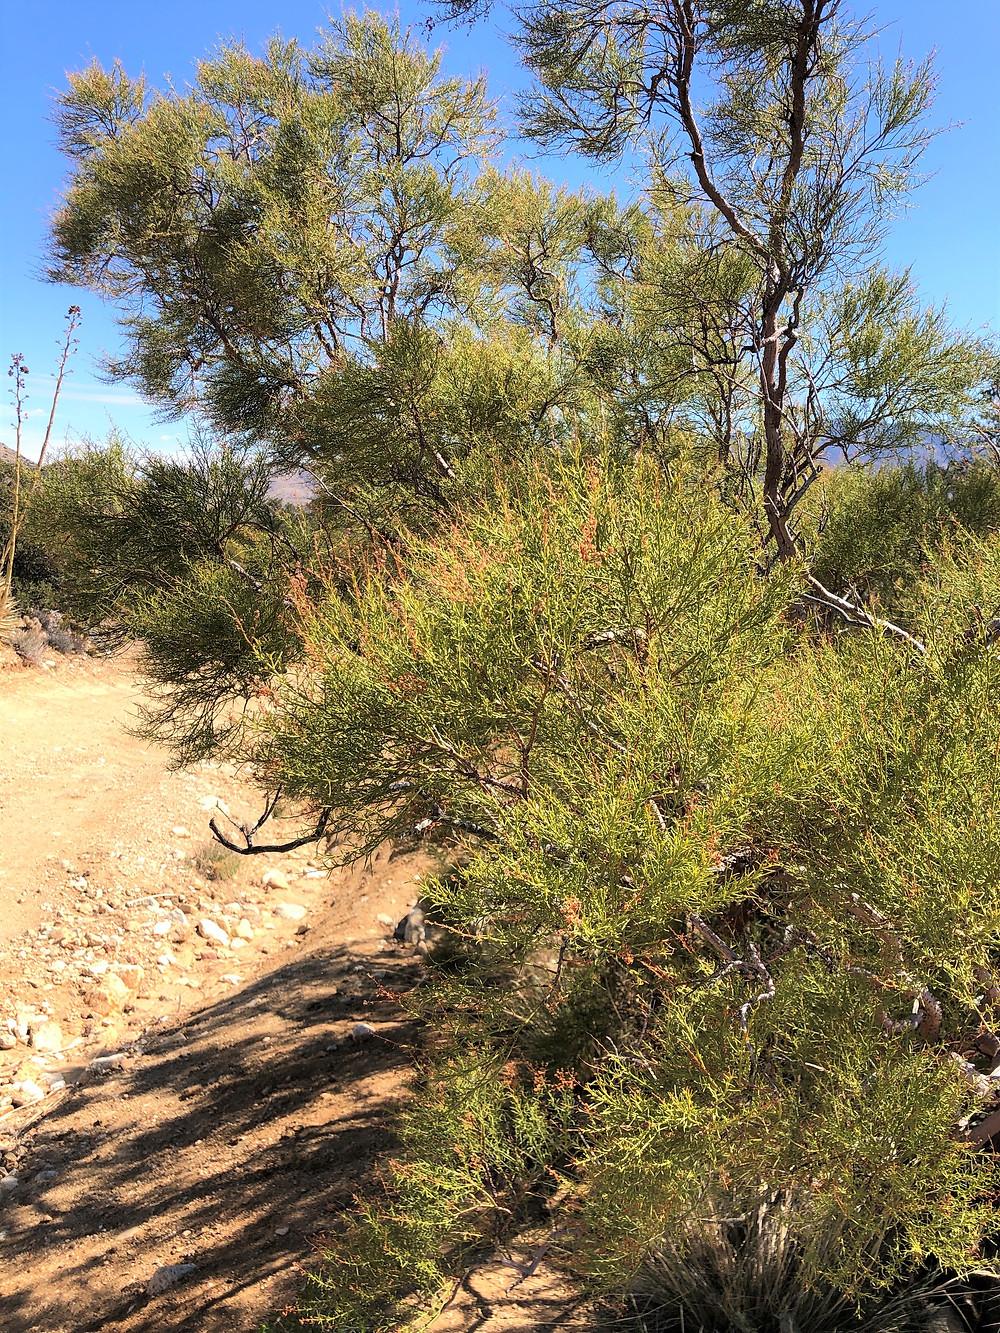 Redshank shrub along the Cactus Spring trail in the Santa Rosa Mountain Wilderness